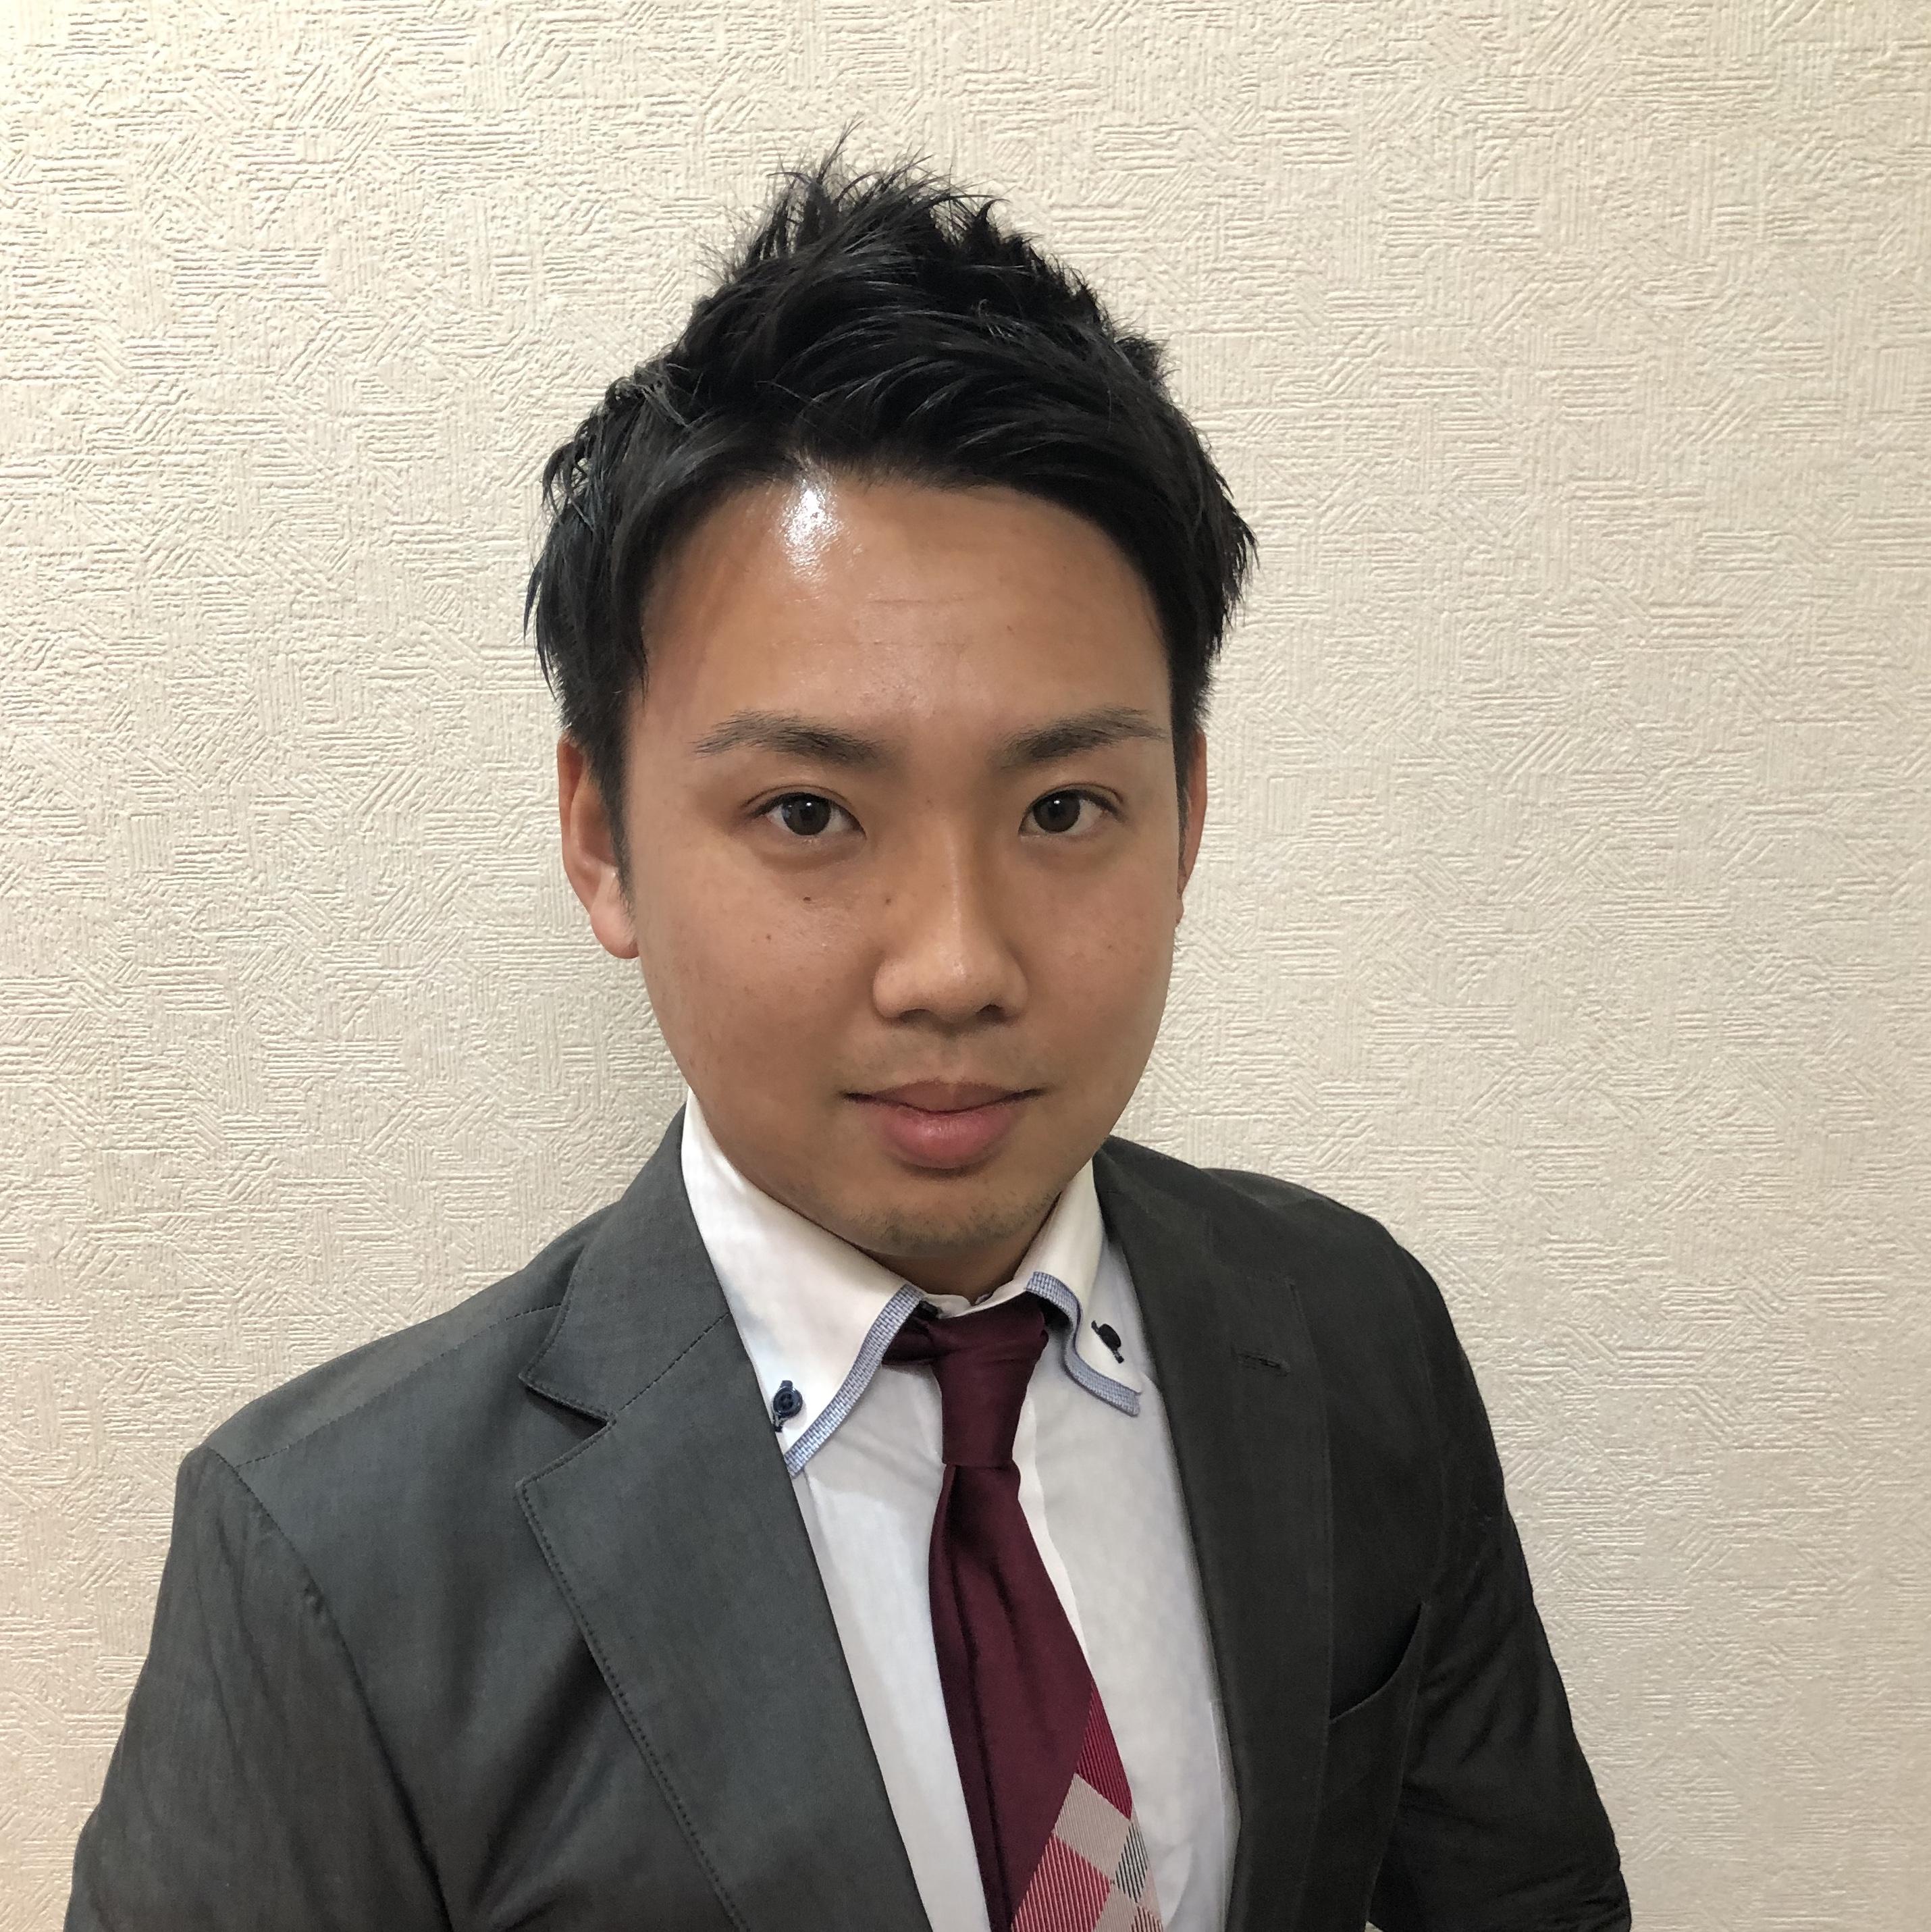 akaishi_square